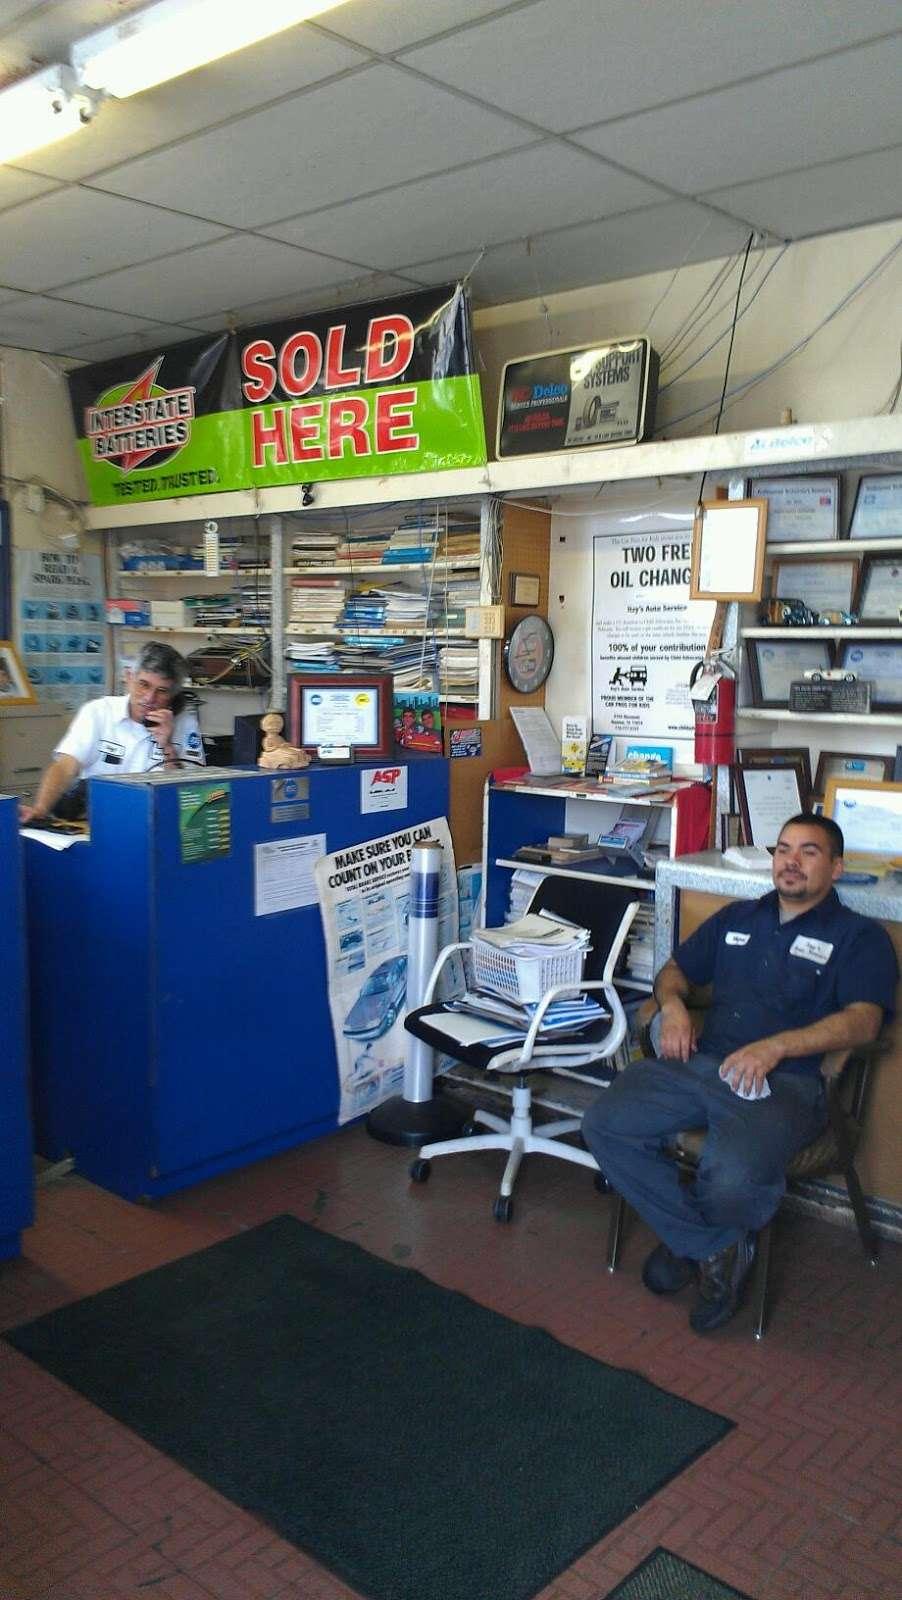 Itzys Auto Repair Services - car repair    Photo 4 of 5   Address: 6703 Bissonnet St, Houston, TX 77074, USA   Phone: (713) 777-2727